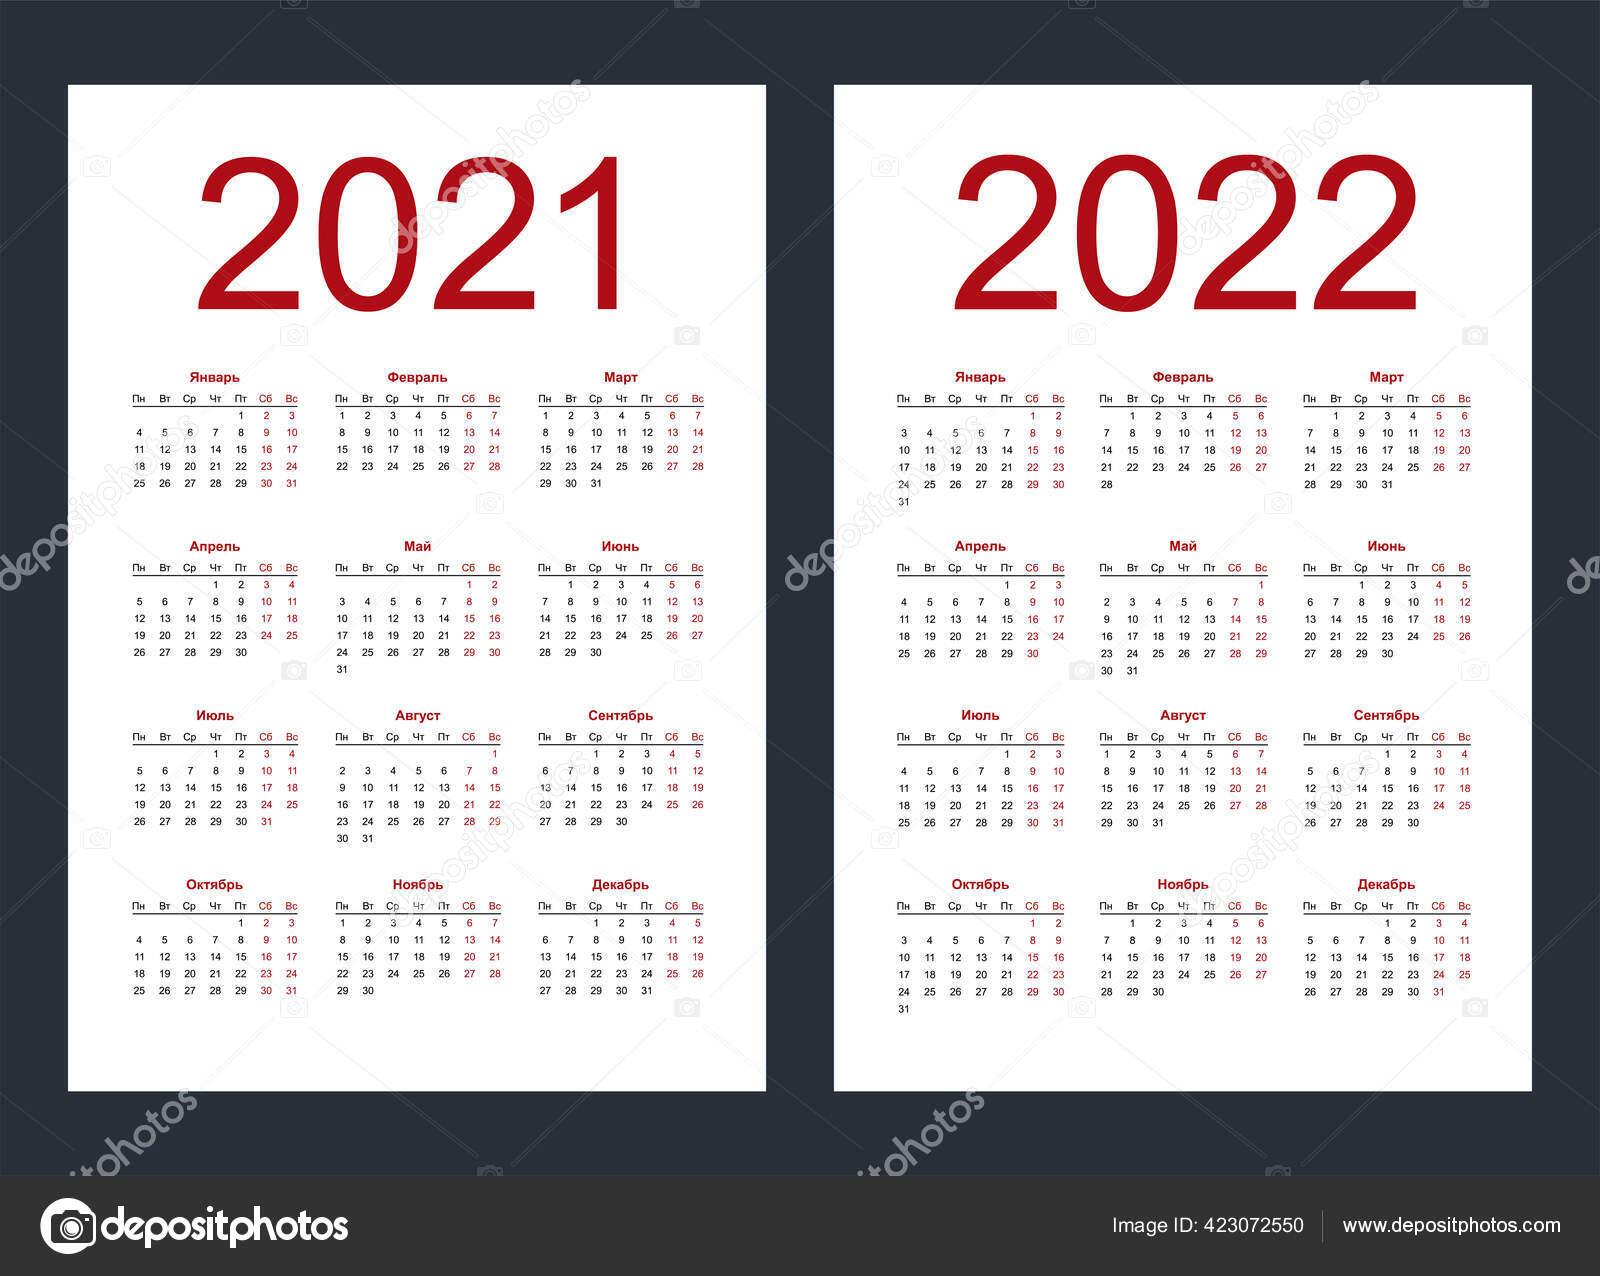 Vietnamese Calendar 2022.18 378 2022 Vectors Royalty Free Vector 2022 Images Depositphotos